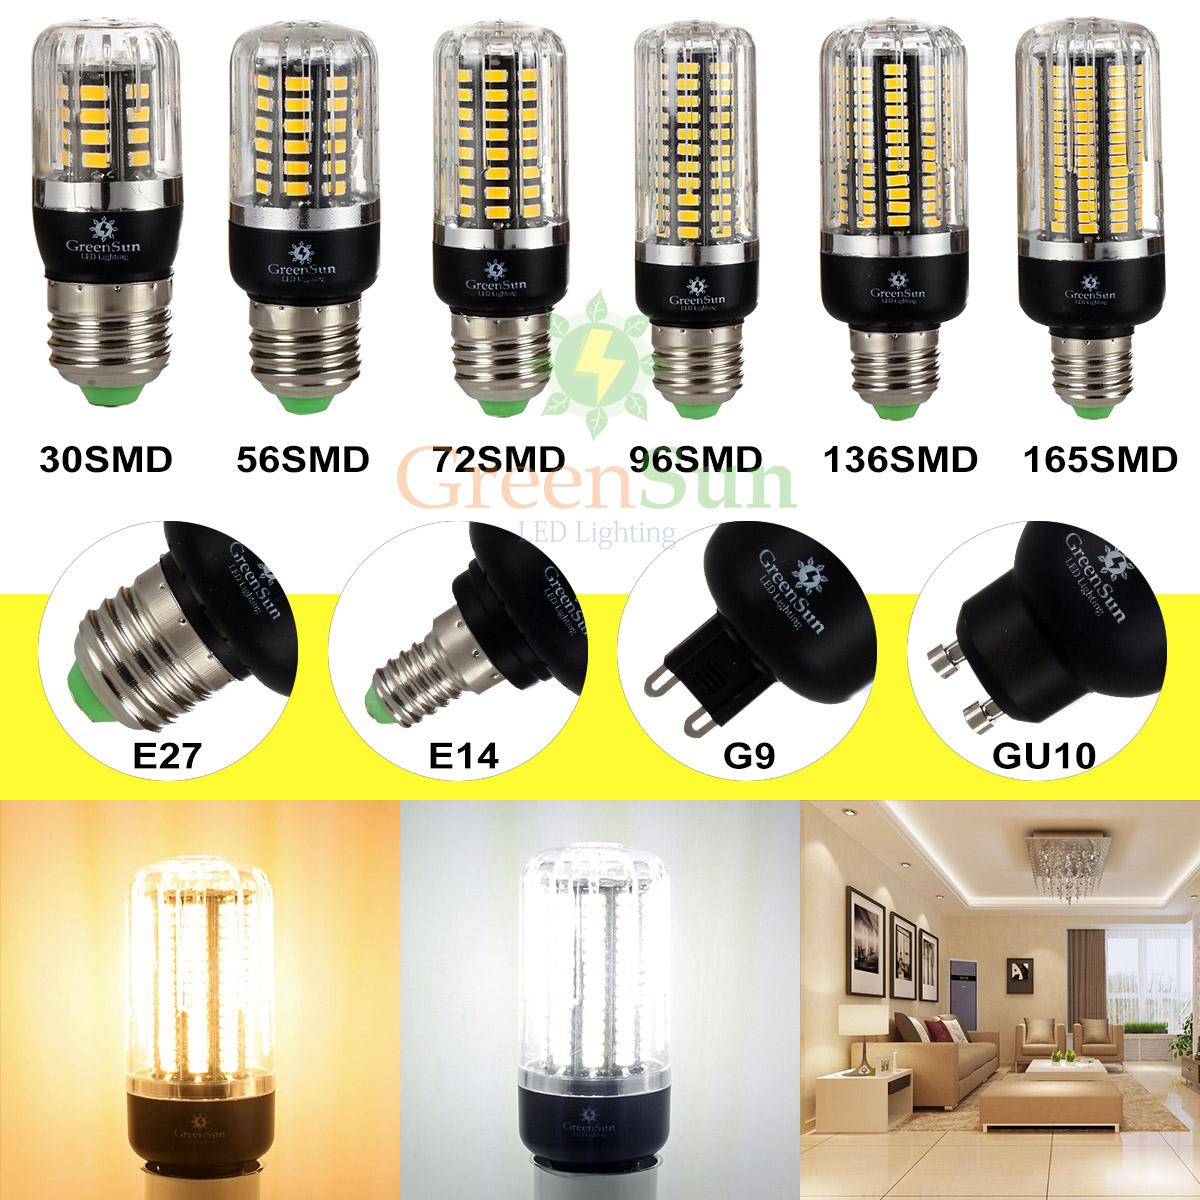 e27 e14 g4 led 5736 5733 2835 smd ma s ampoule lampe spot. Black Bedroom Furniture Sets. Home Design Ideas